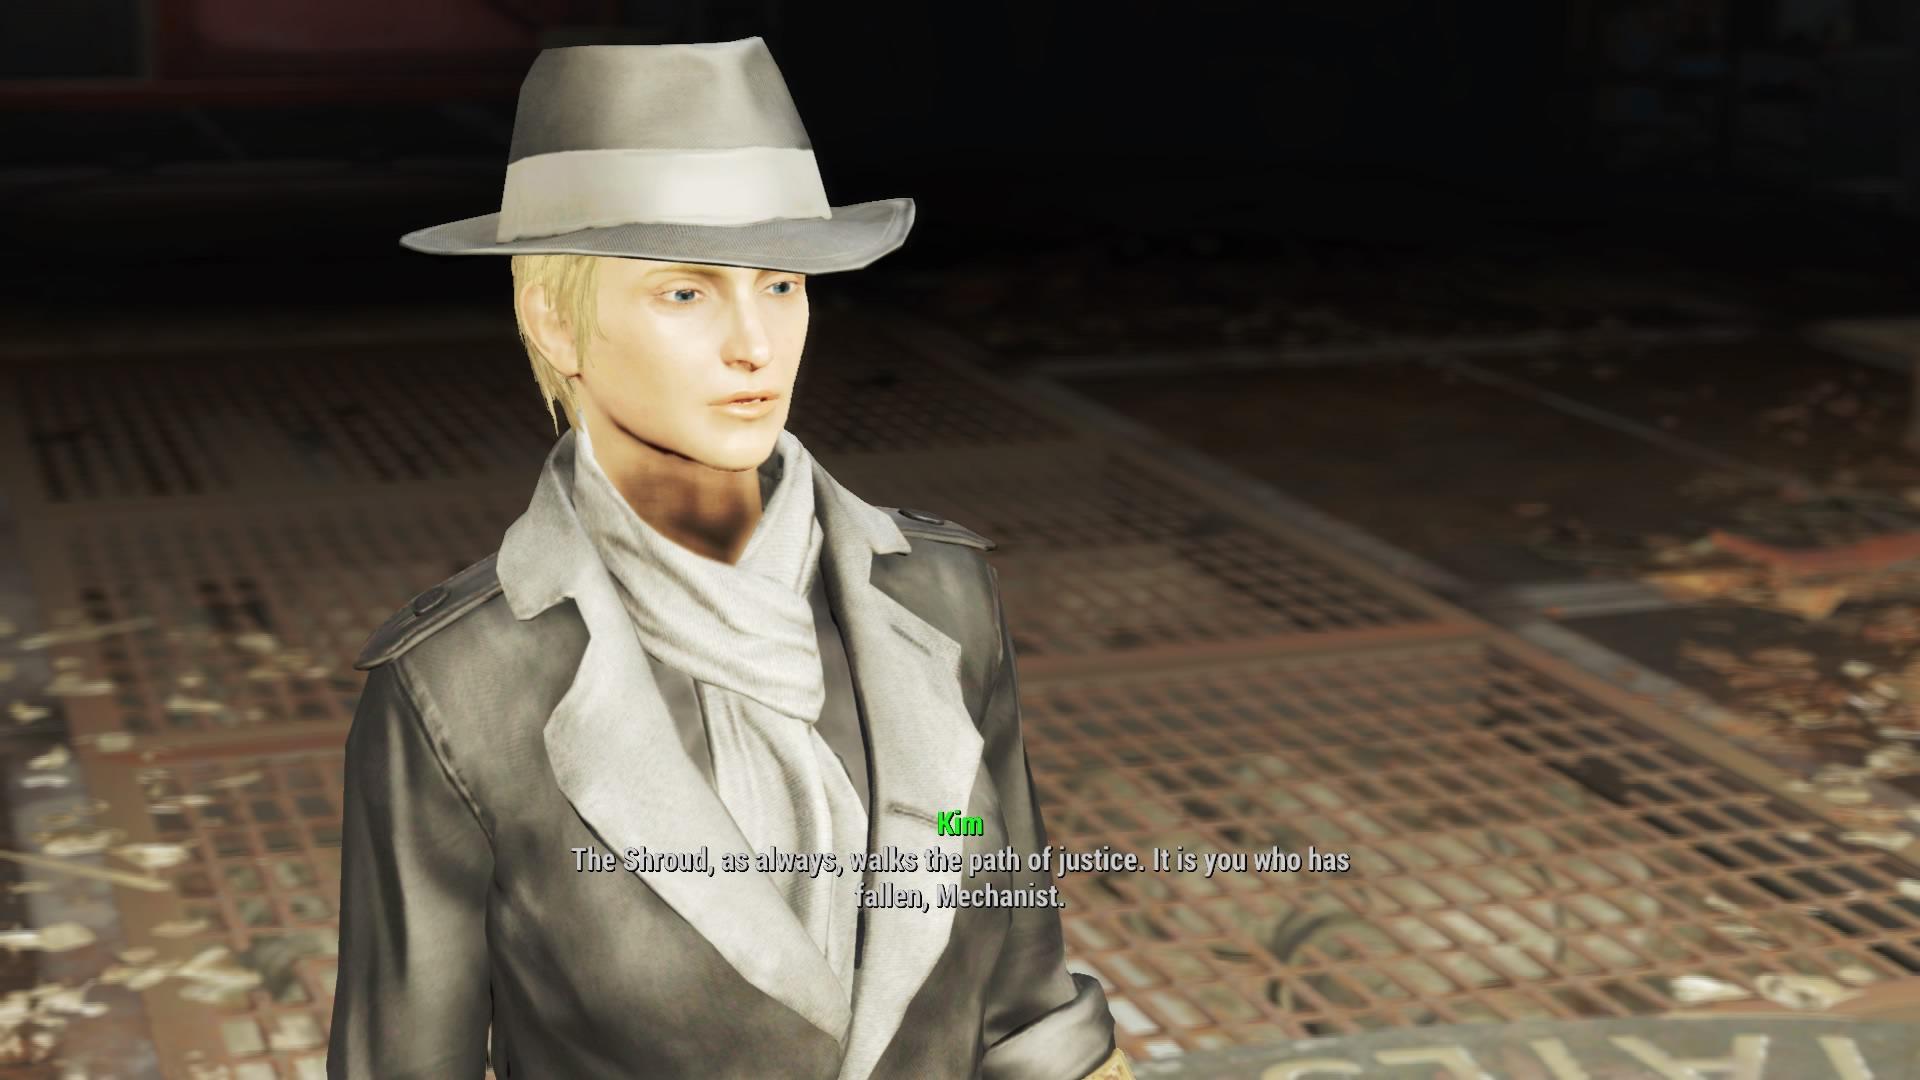 Fallout 4 Automatron Silver Shroud Easter Egg